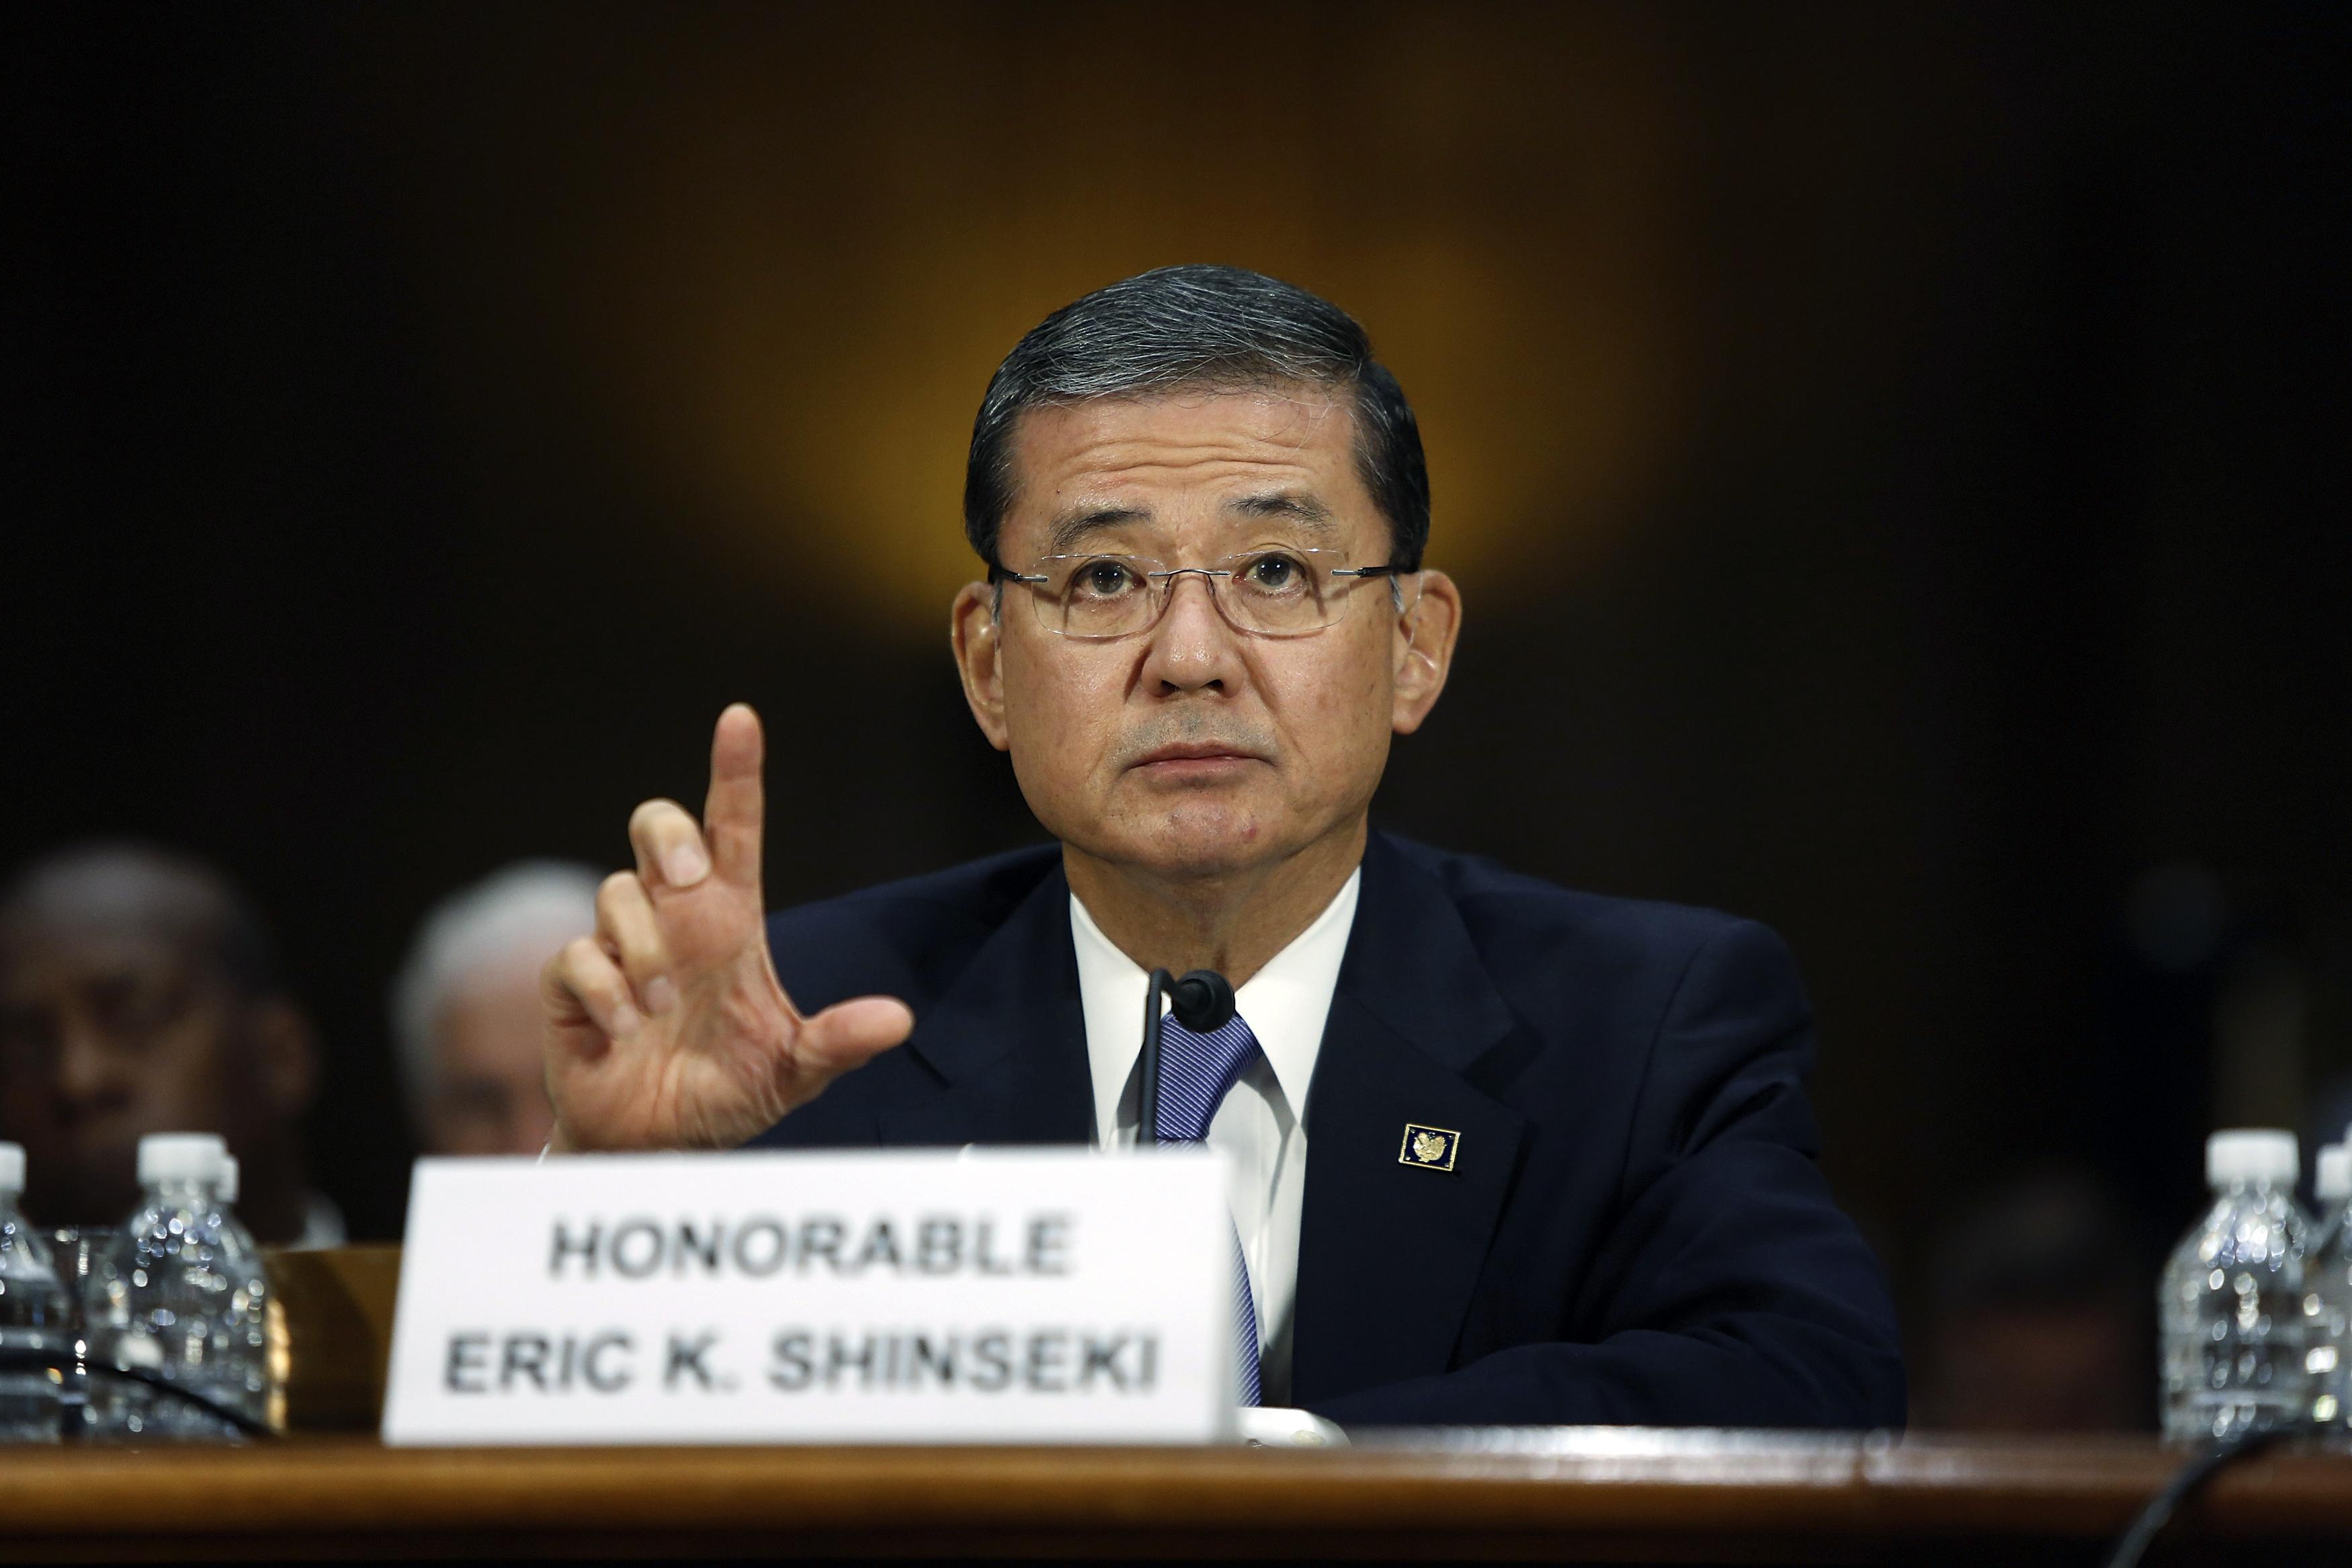 U.S. Department of Veterans Affairs Secretary Eric Shinseki testifies before a Senate Veterans Affairs Committee hearing on VA health care, on Capitol Hill in Washington, D.C., on May 15, 2014.